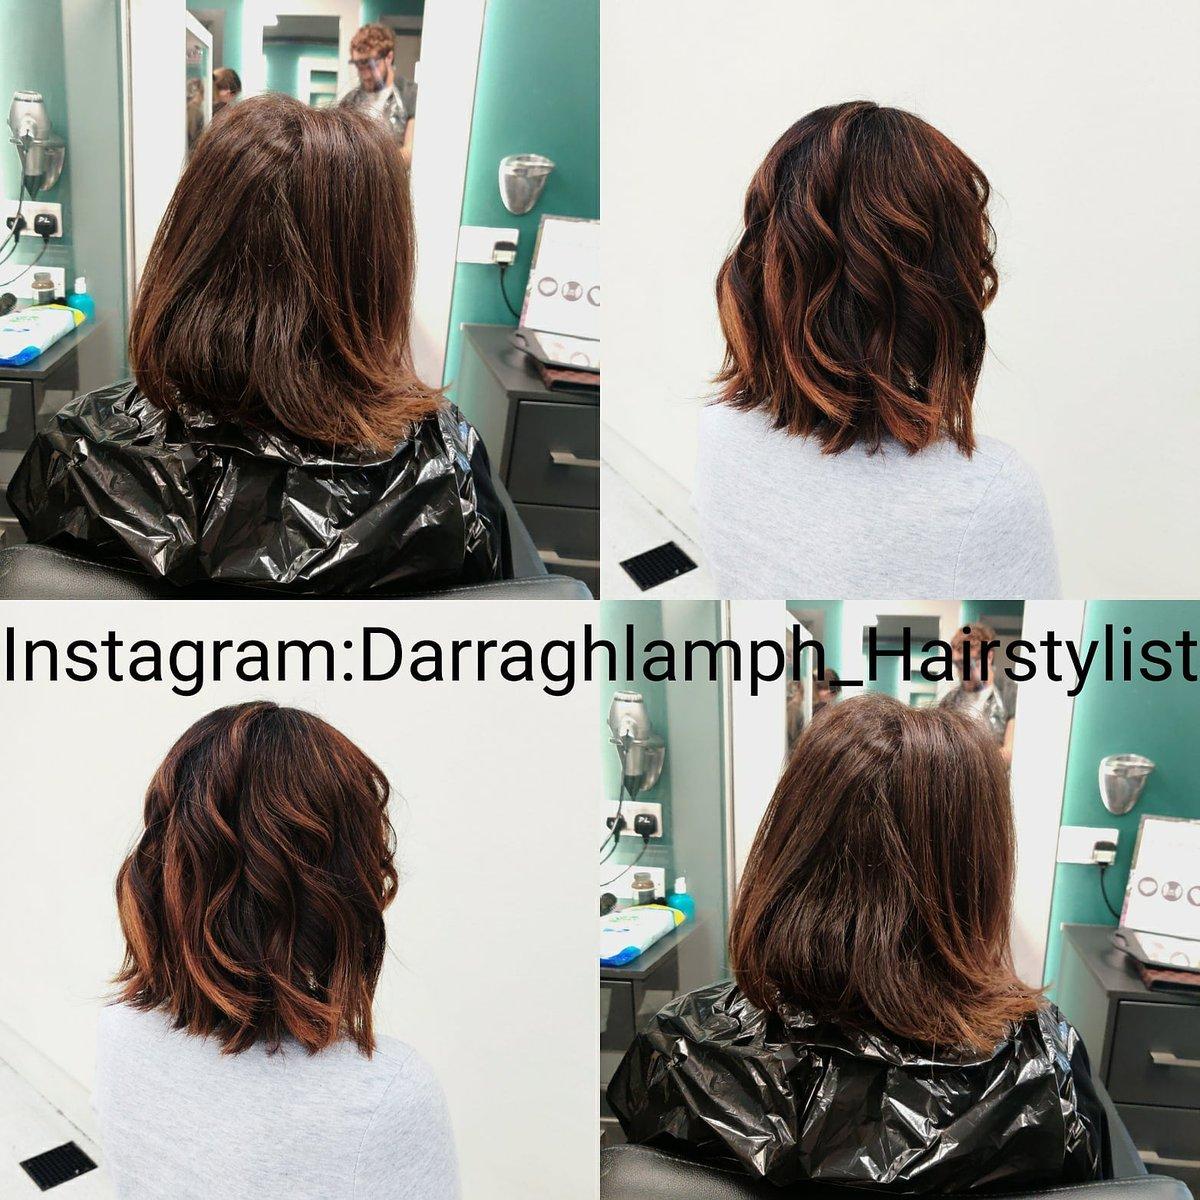 Before and after free-hand blends #hairpro #colourmaster #colourpro #colour #blends #hairartist #hairporn #hairdressinggift #hairoftheday #hairdressingmagic #hairwaves #waves #colourpop #alfaparfcolourwear #alfaparfmilano @AlfaparfIrelandpic.twitter.com/Evzgj6qoX2